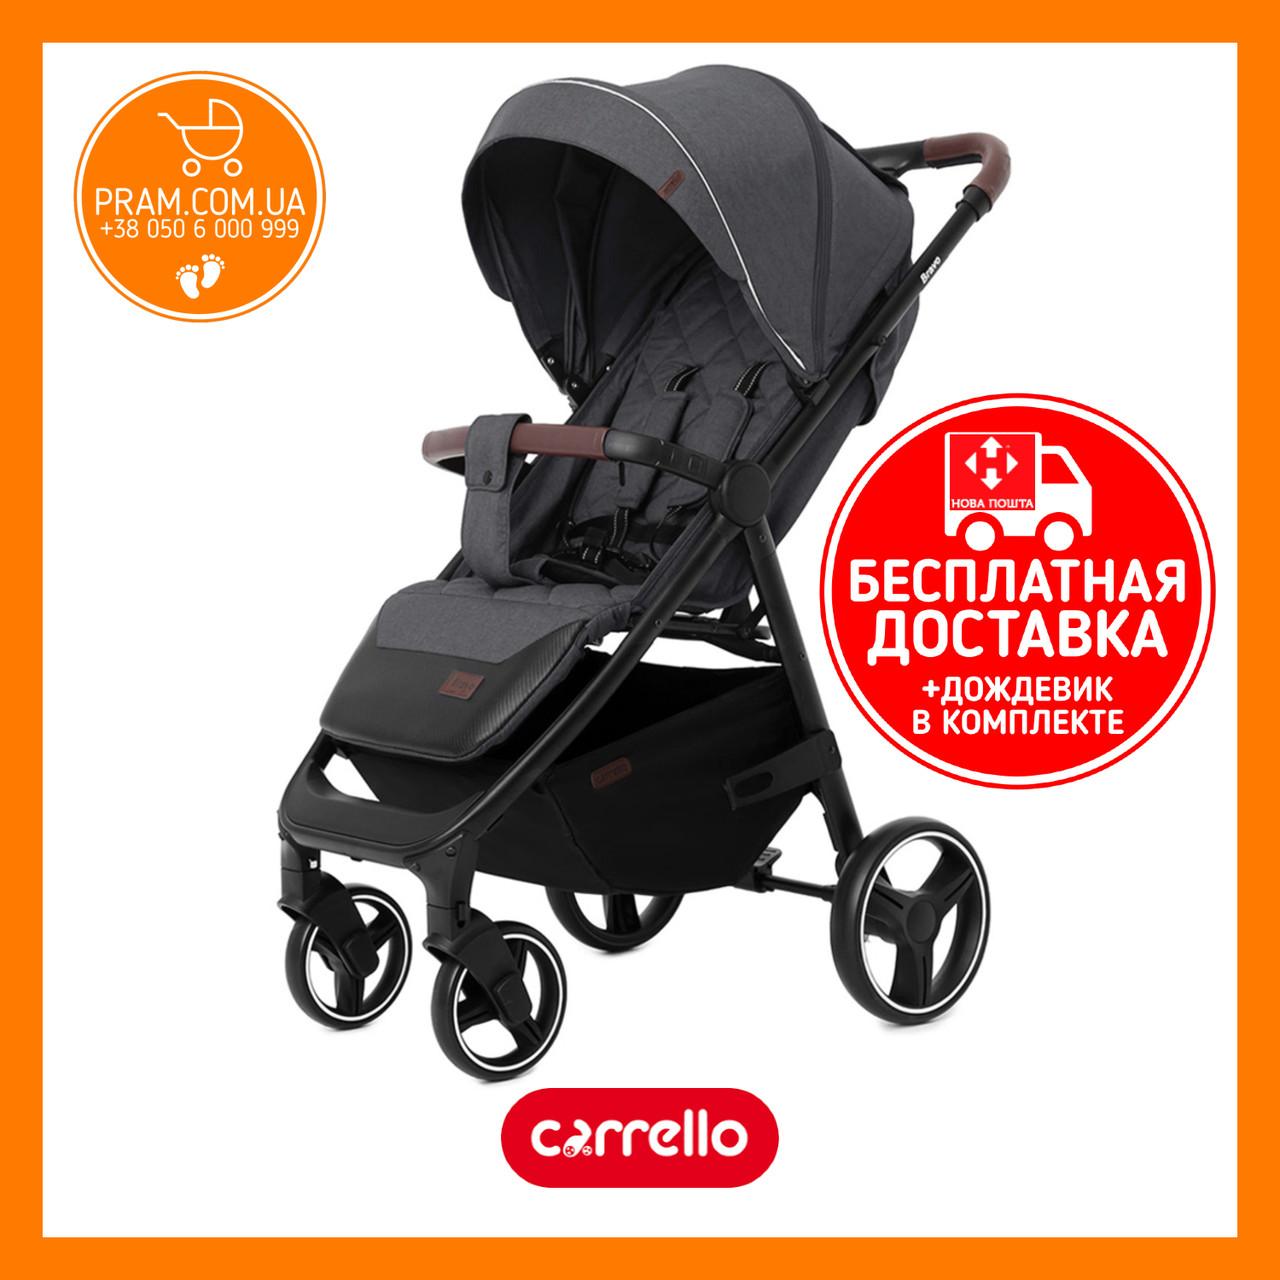 CARRELLO BRAVO CRL-8512 прогулочная коляска Serious Grey